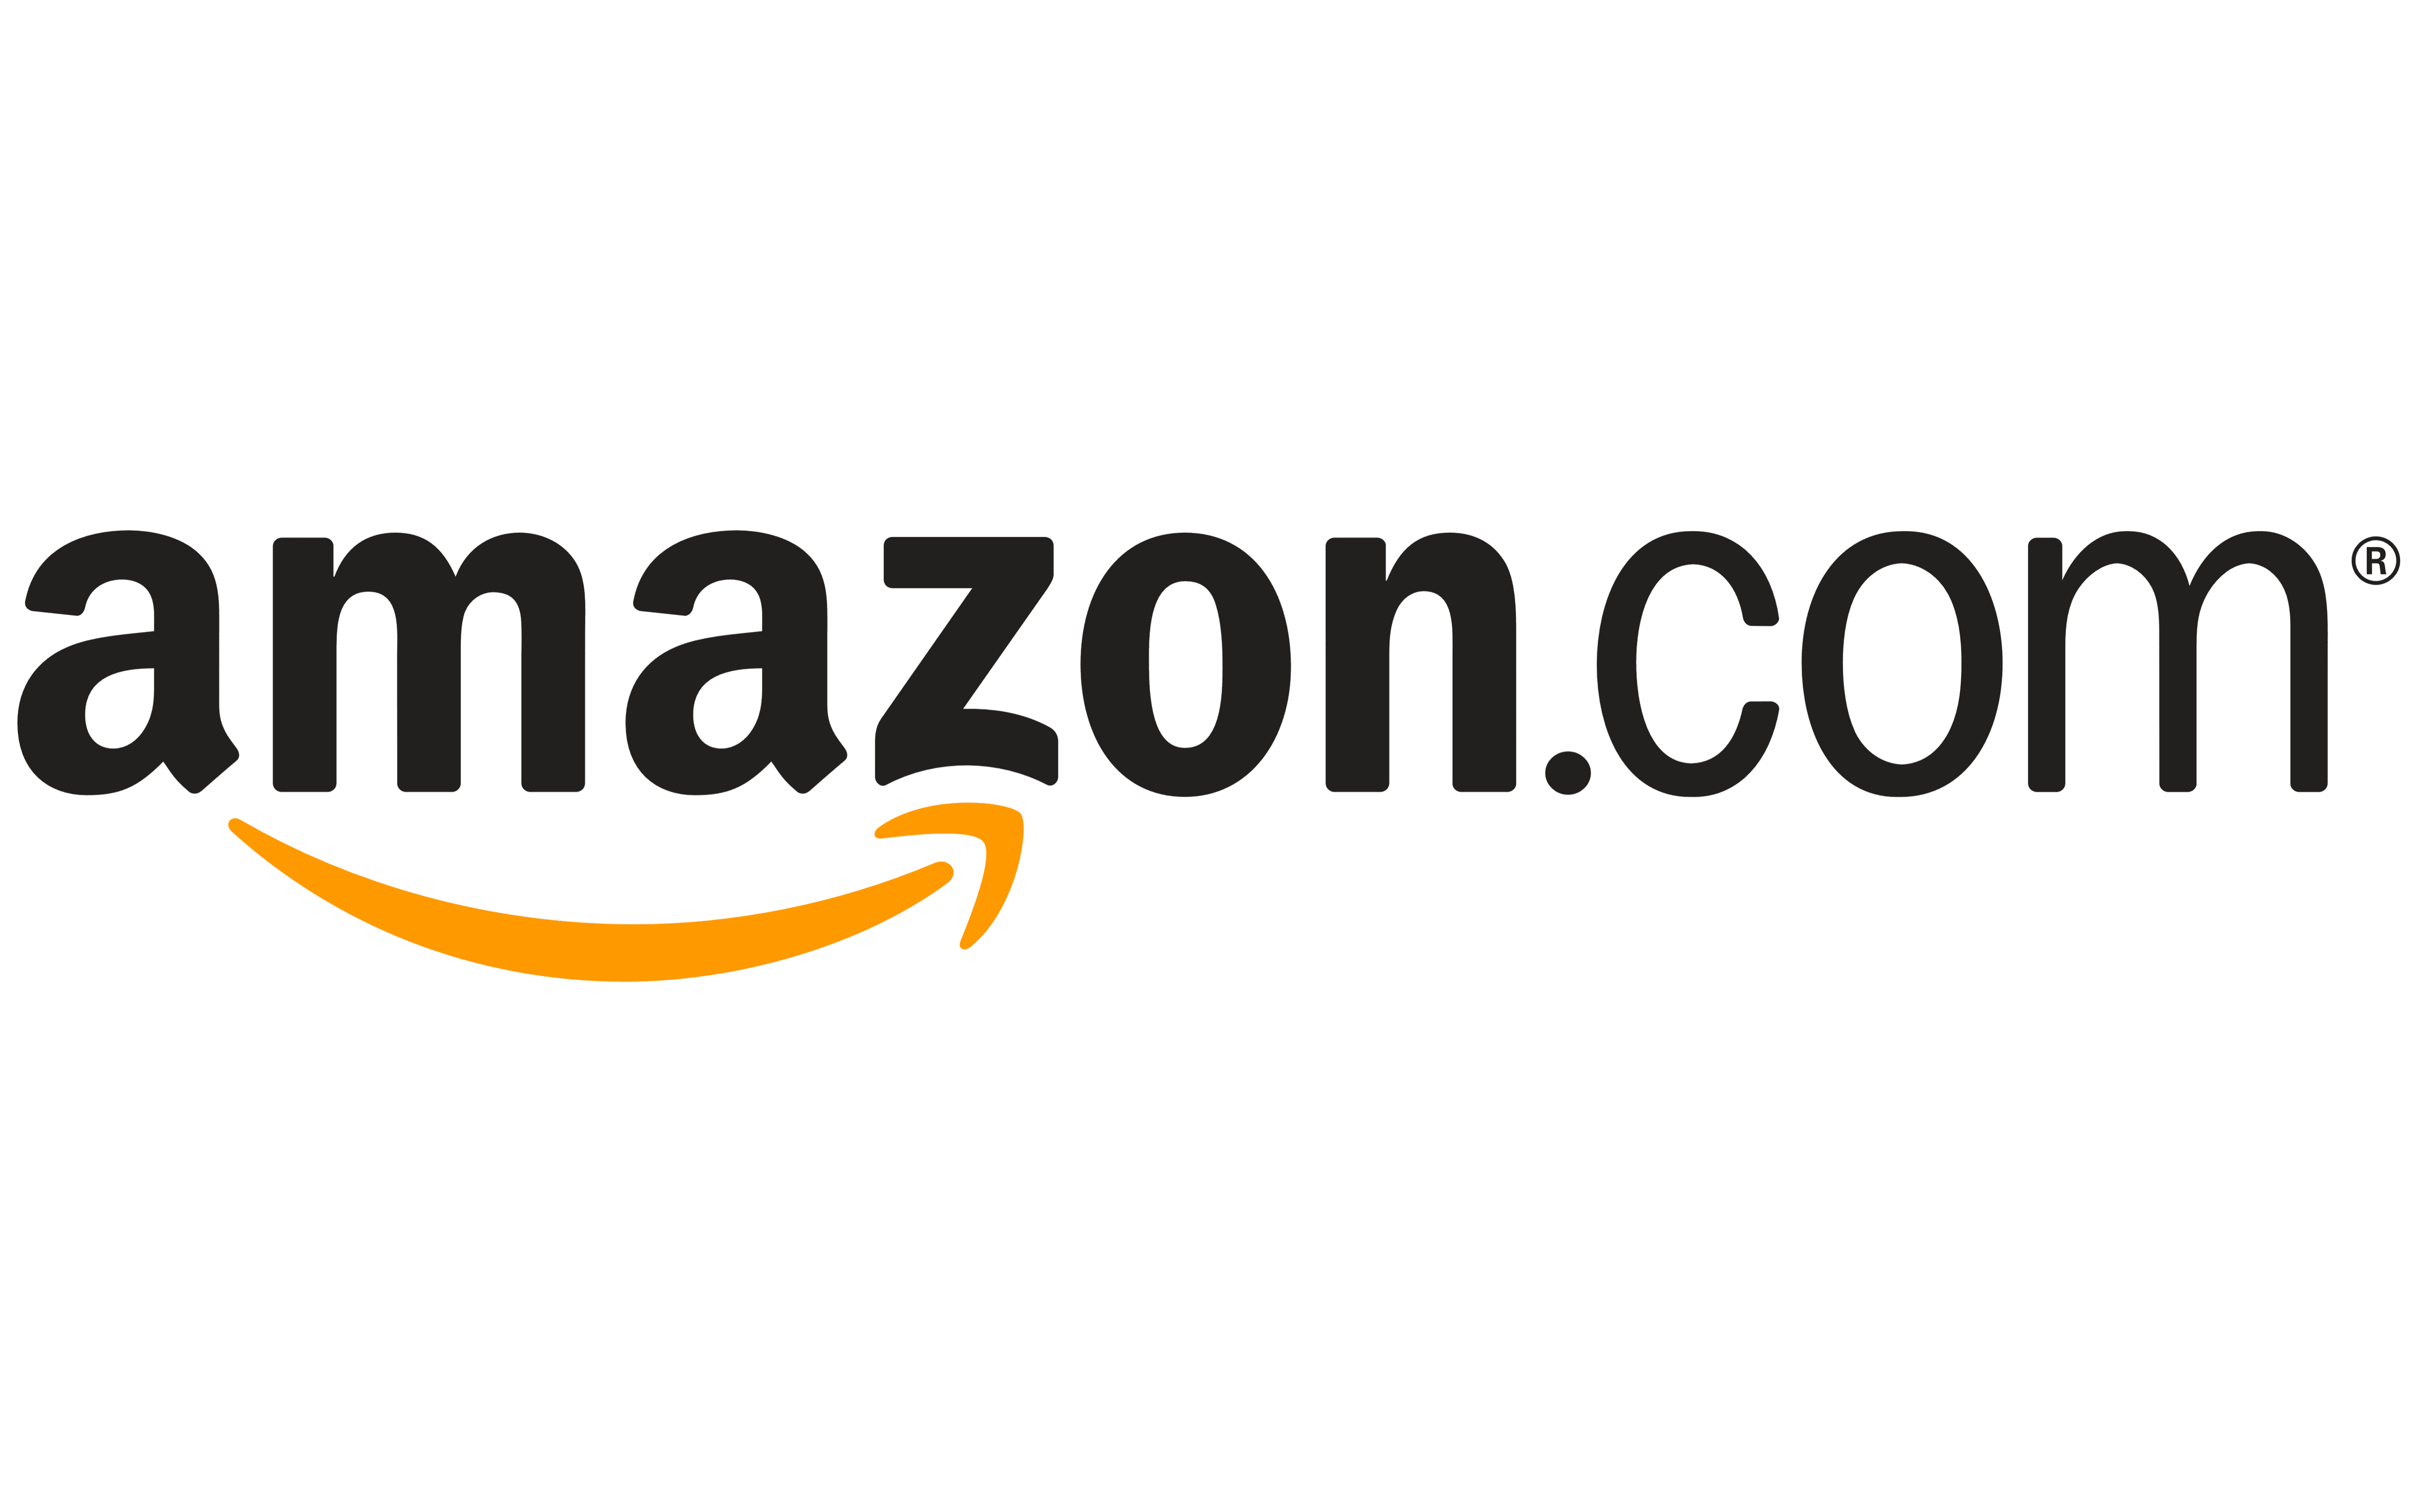 Amazon Logo, Amazon Symbol Meaning, History and Evolution - Amazon Company Logo